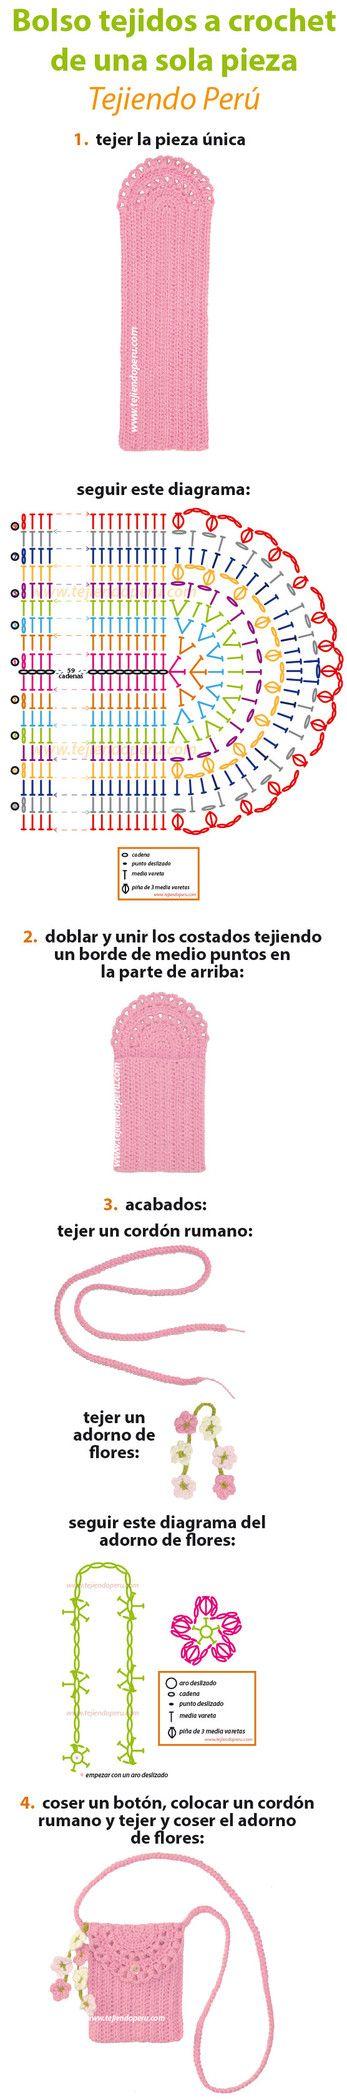 Monedero o bolsito tejido a crochet de una sola pieza